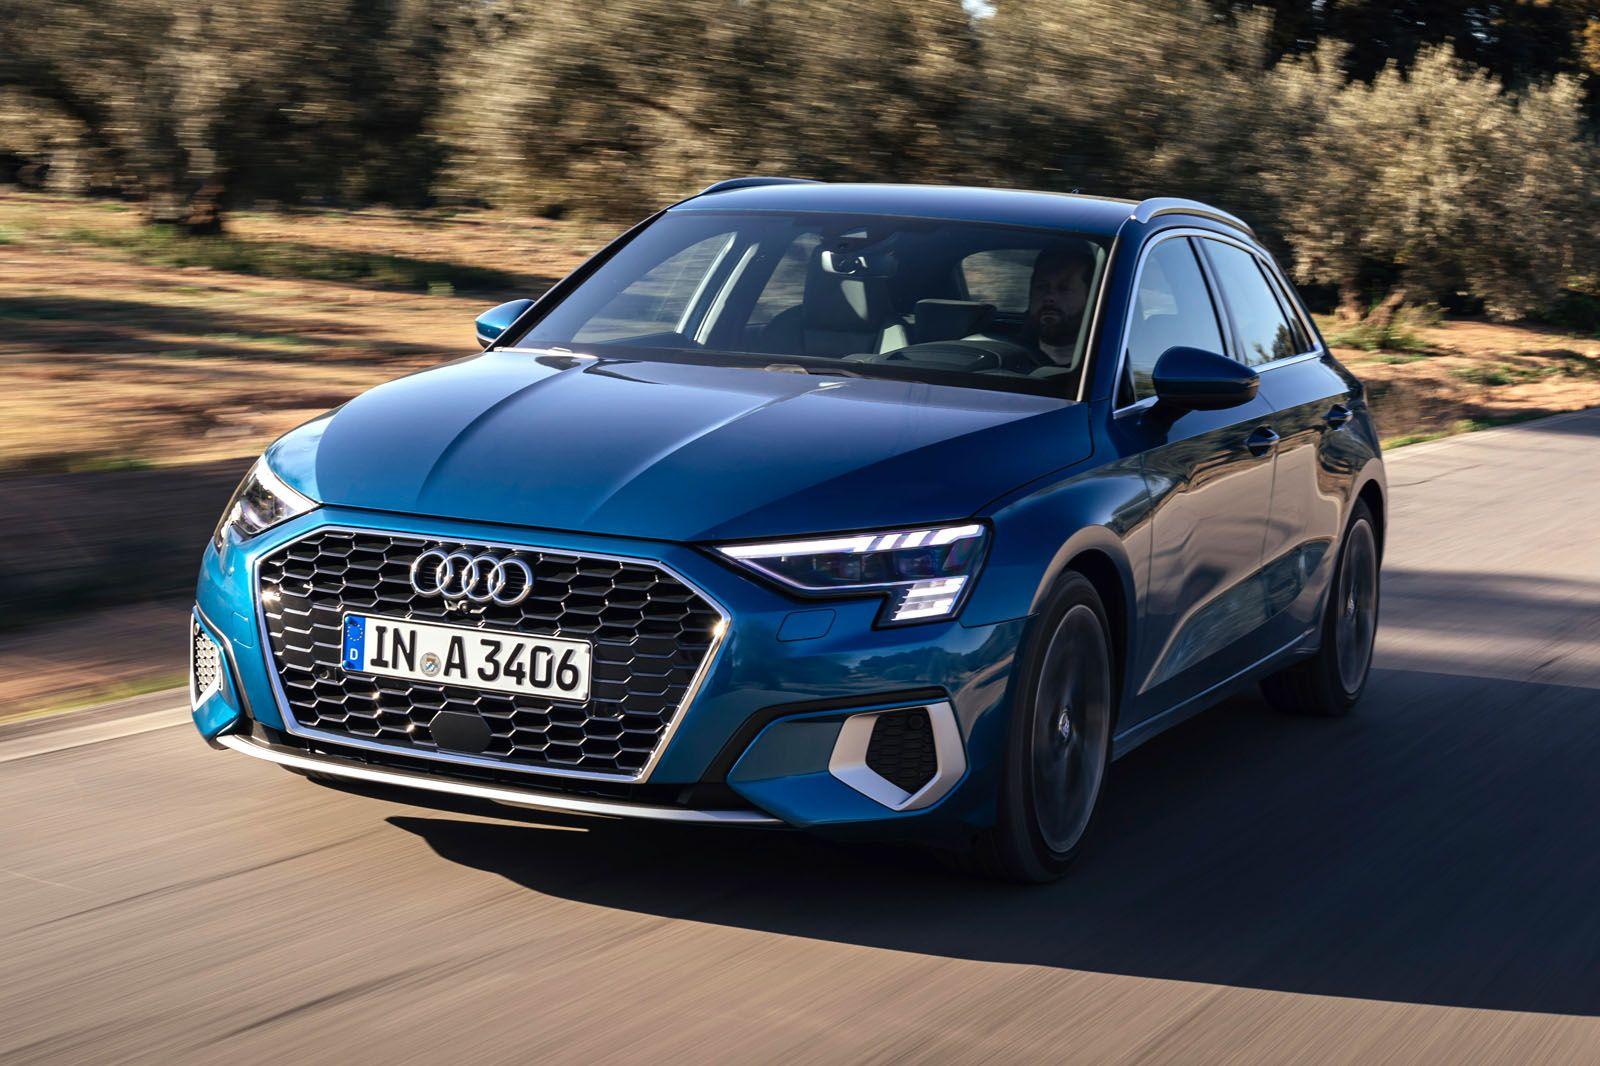 Audi A3 Sportback 35 TDI S tronic S line 2020 review https